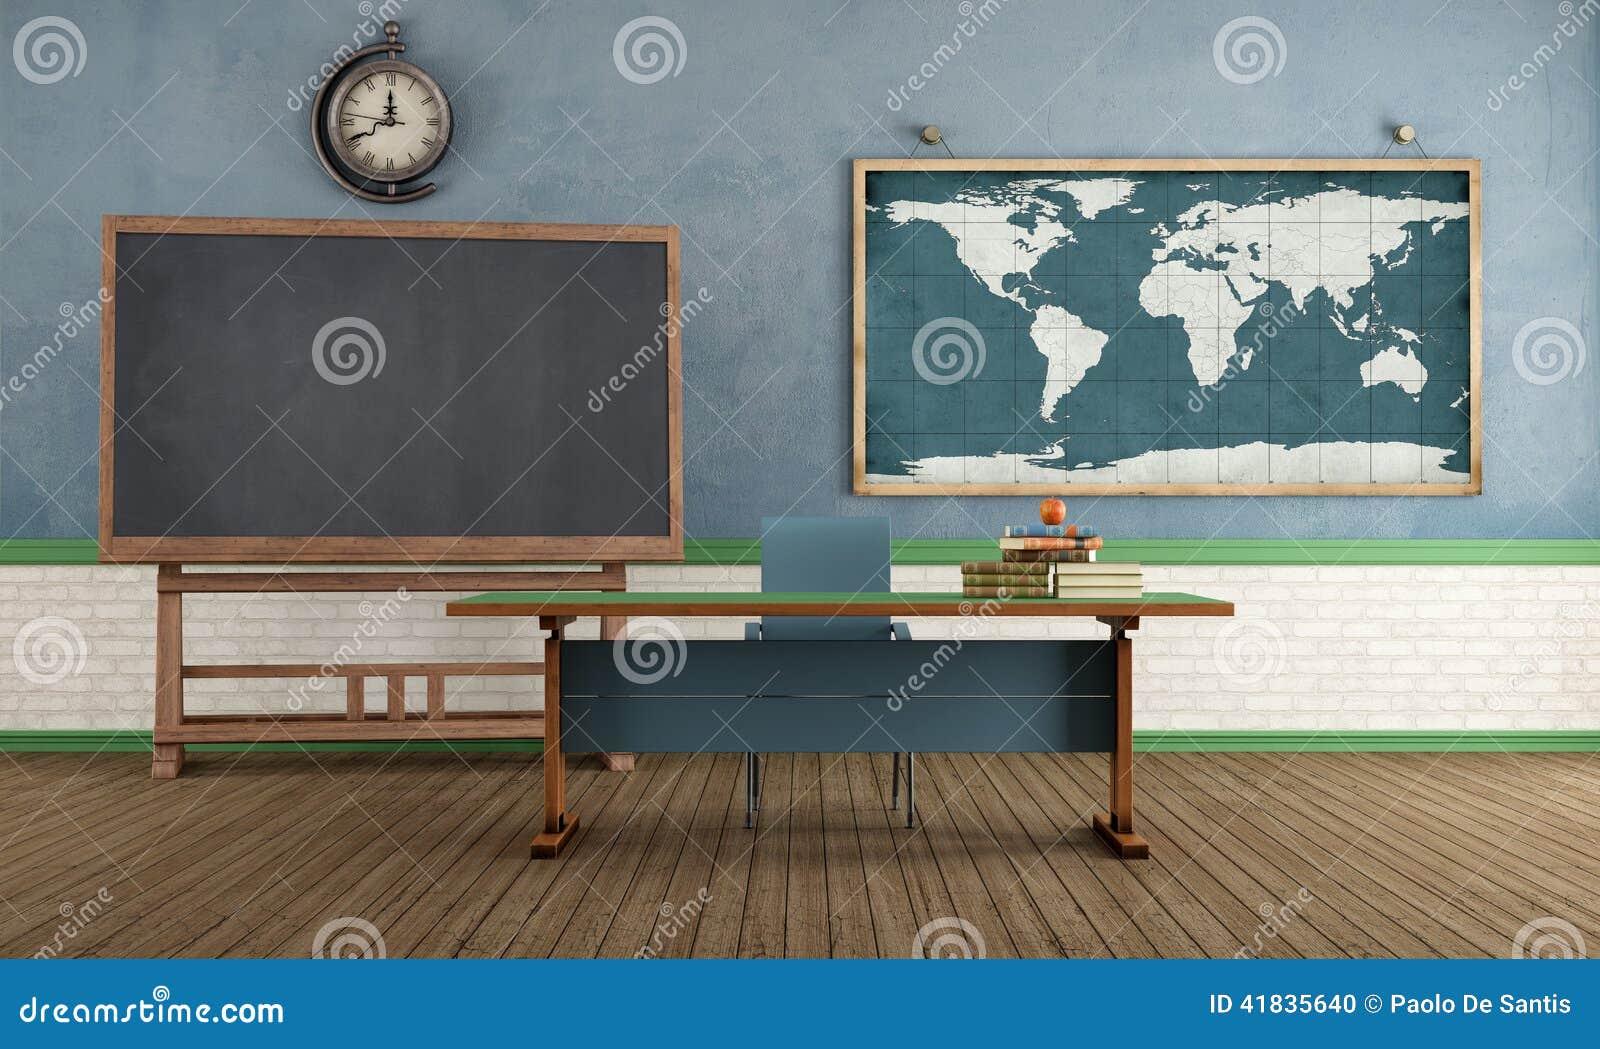 Blackboard Innovative Classroom ~ Retro classroom without student stock illustration